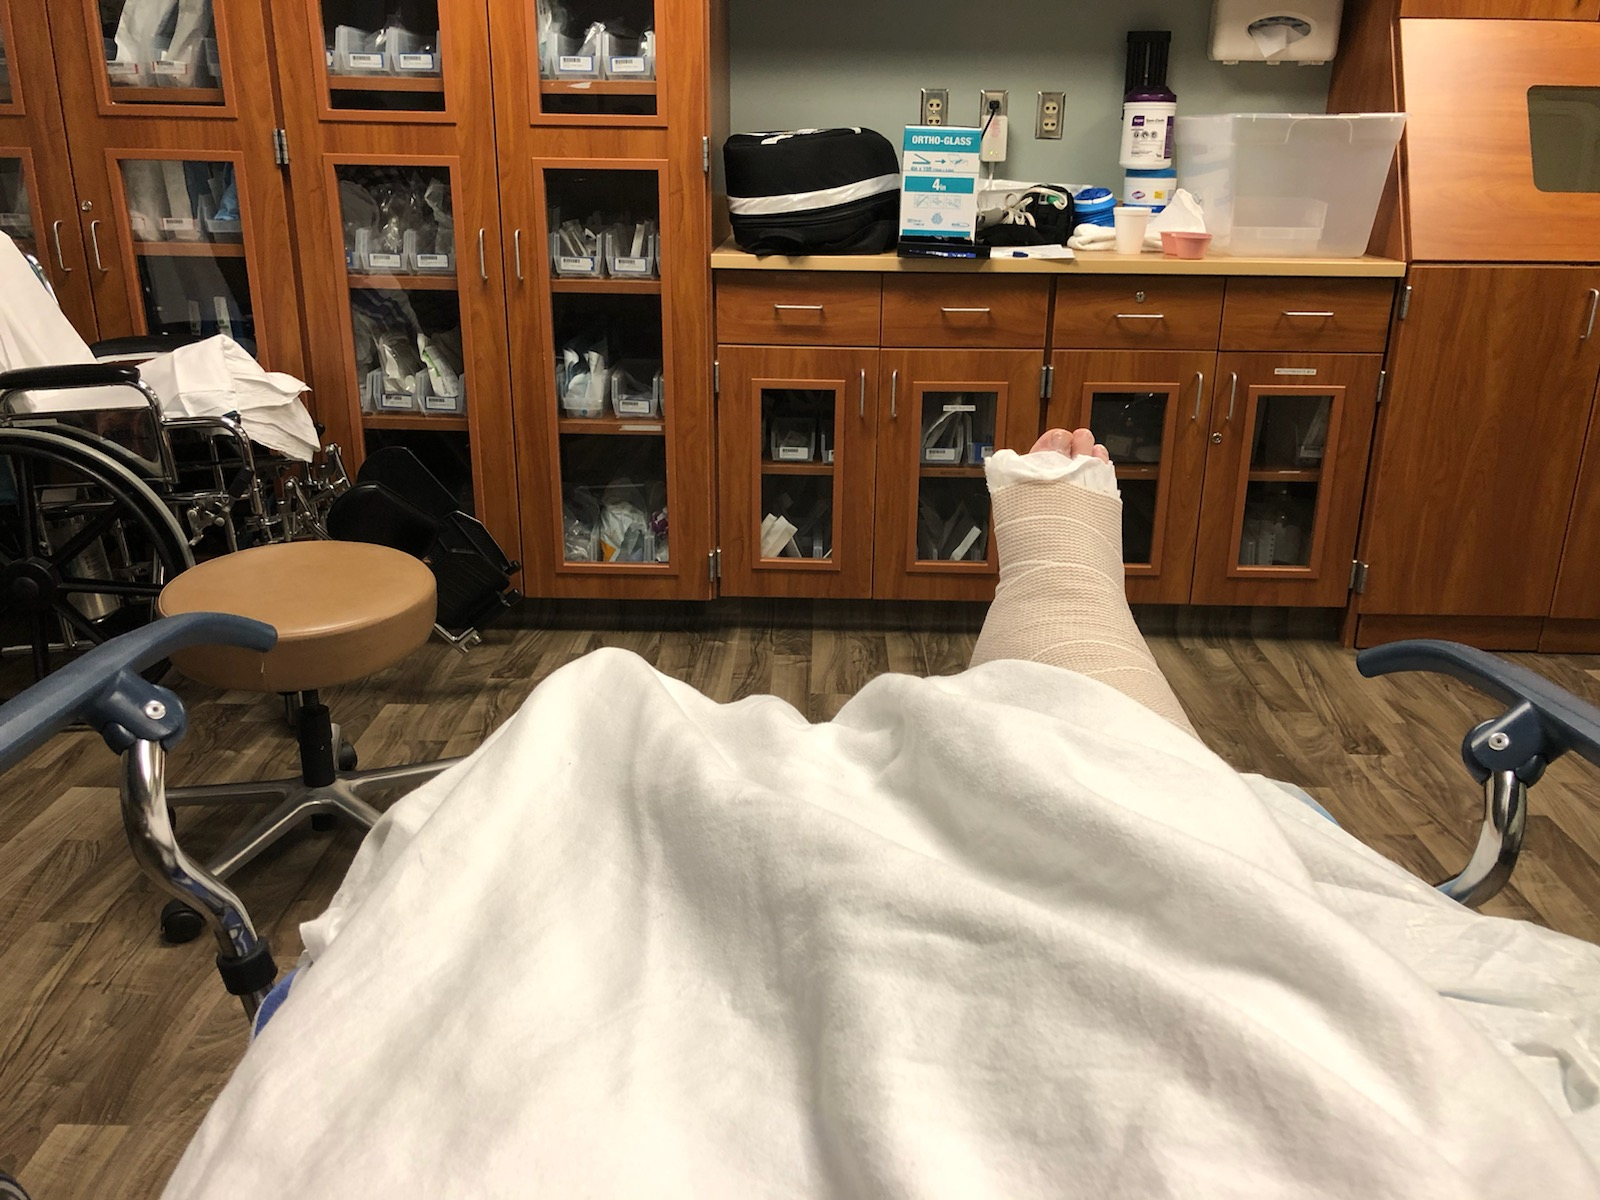 In the ER